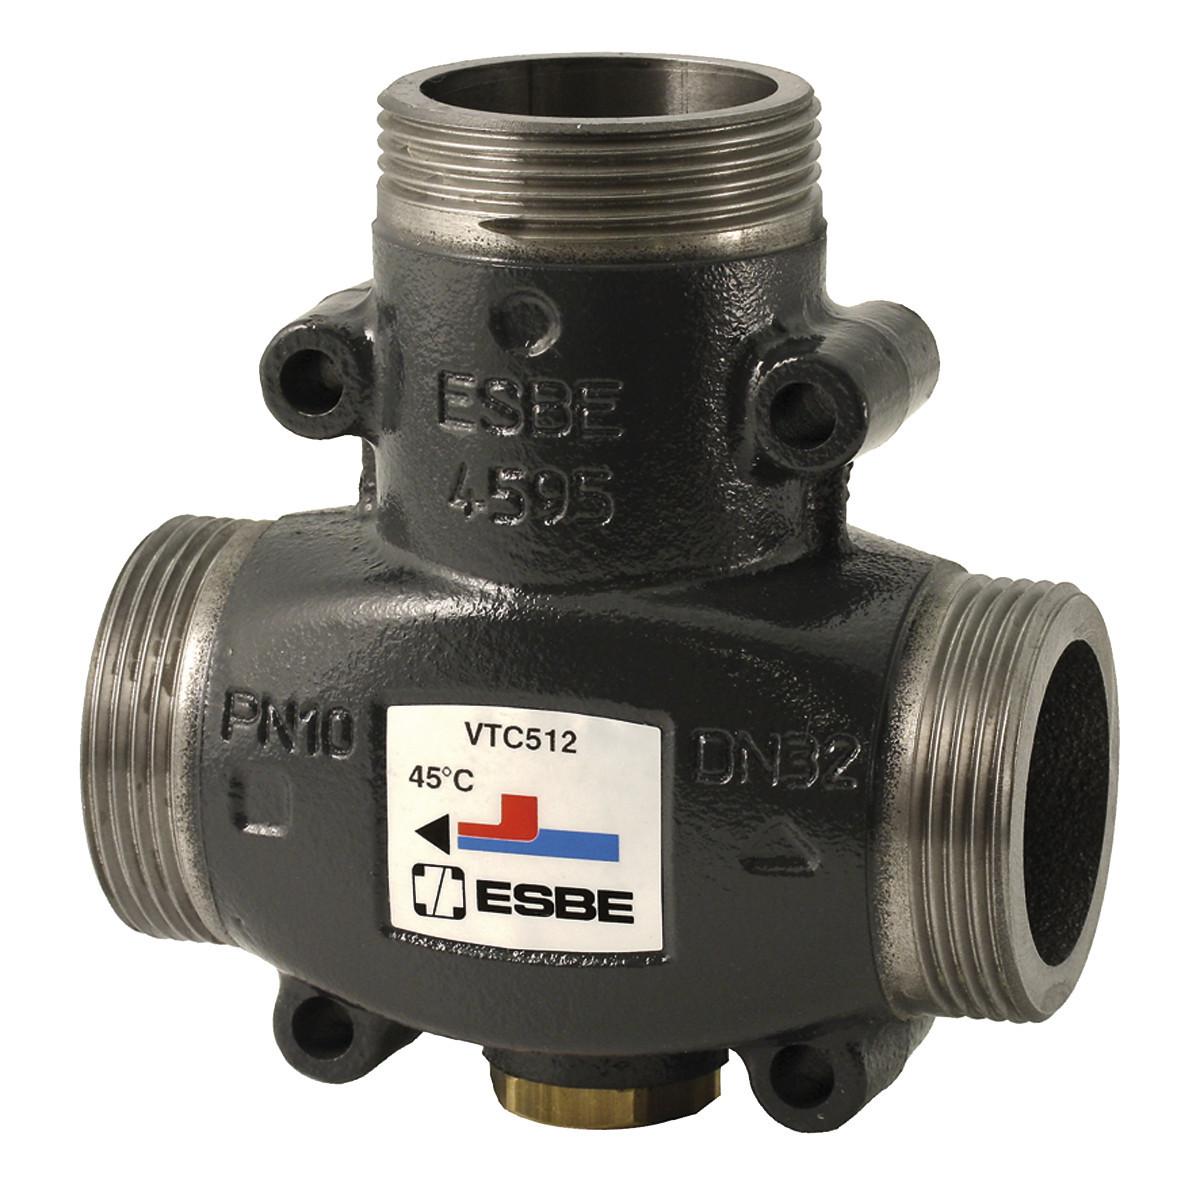 Триходовий термо клапан ESBE VTC 512 DN32 х 50* (G ø1'1/2, kvs 14 м3/г) 510 22 000 (чуг,PN10, 110°)